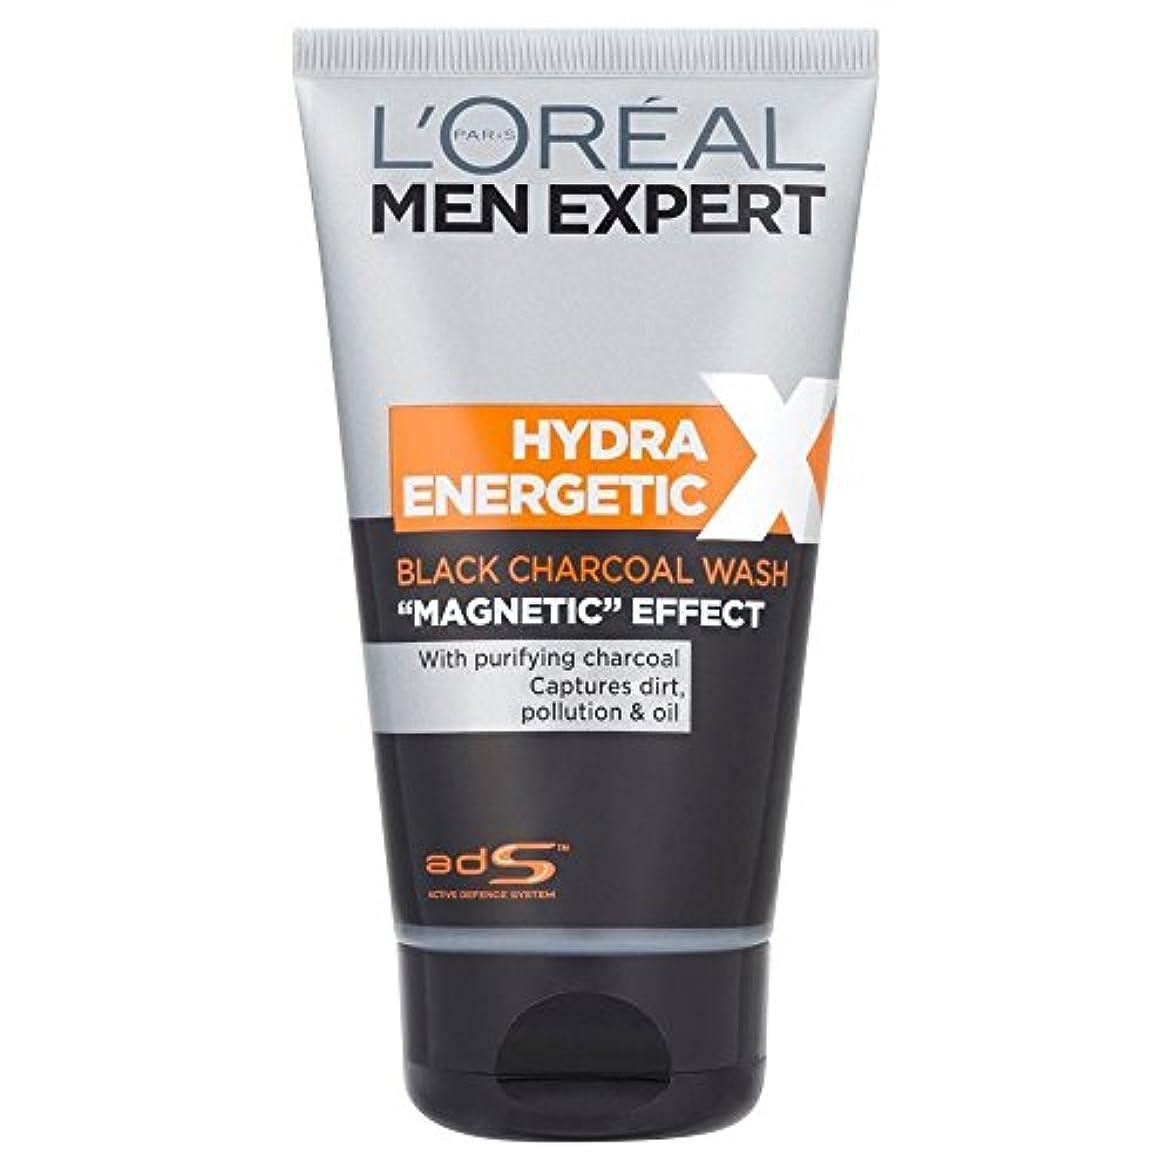 L'Oreal Paris Men Expert Hydra Energetic Daily Purifying Wash (150ml) L'オラ?アルパリのメンズ専門ヒドラエネルギッシュな毎日の浄化洗浄( 150ミリリットル)